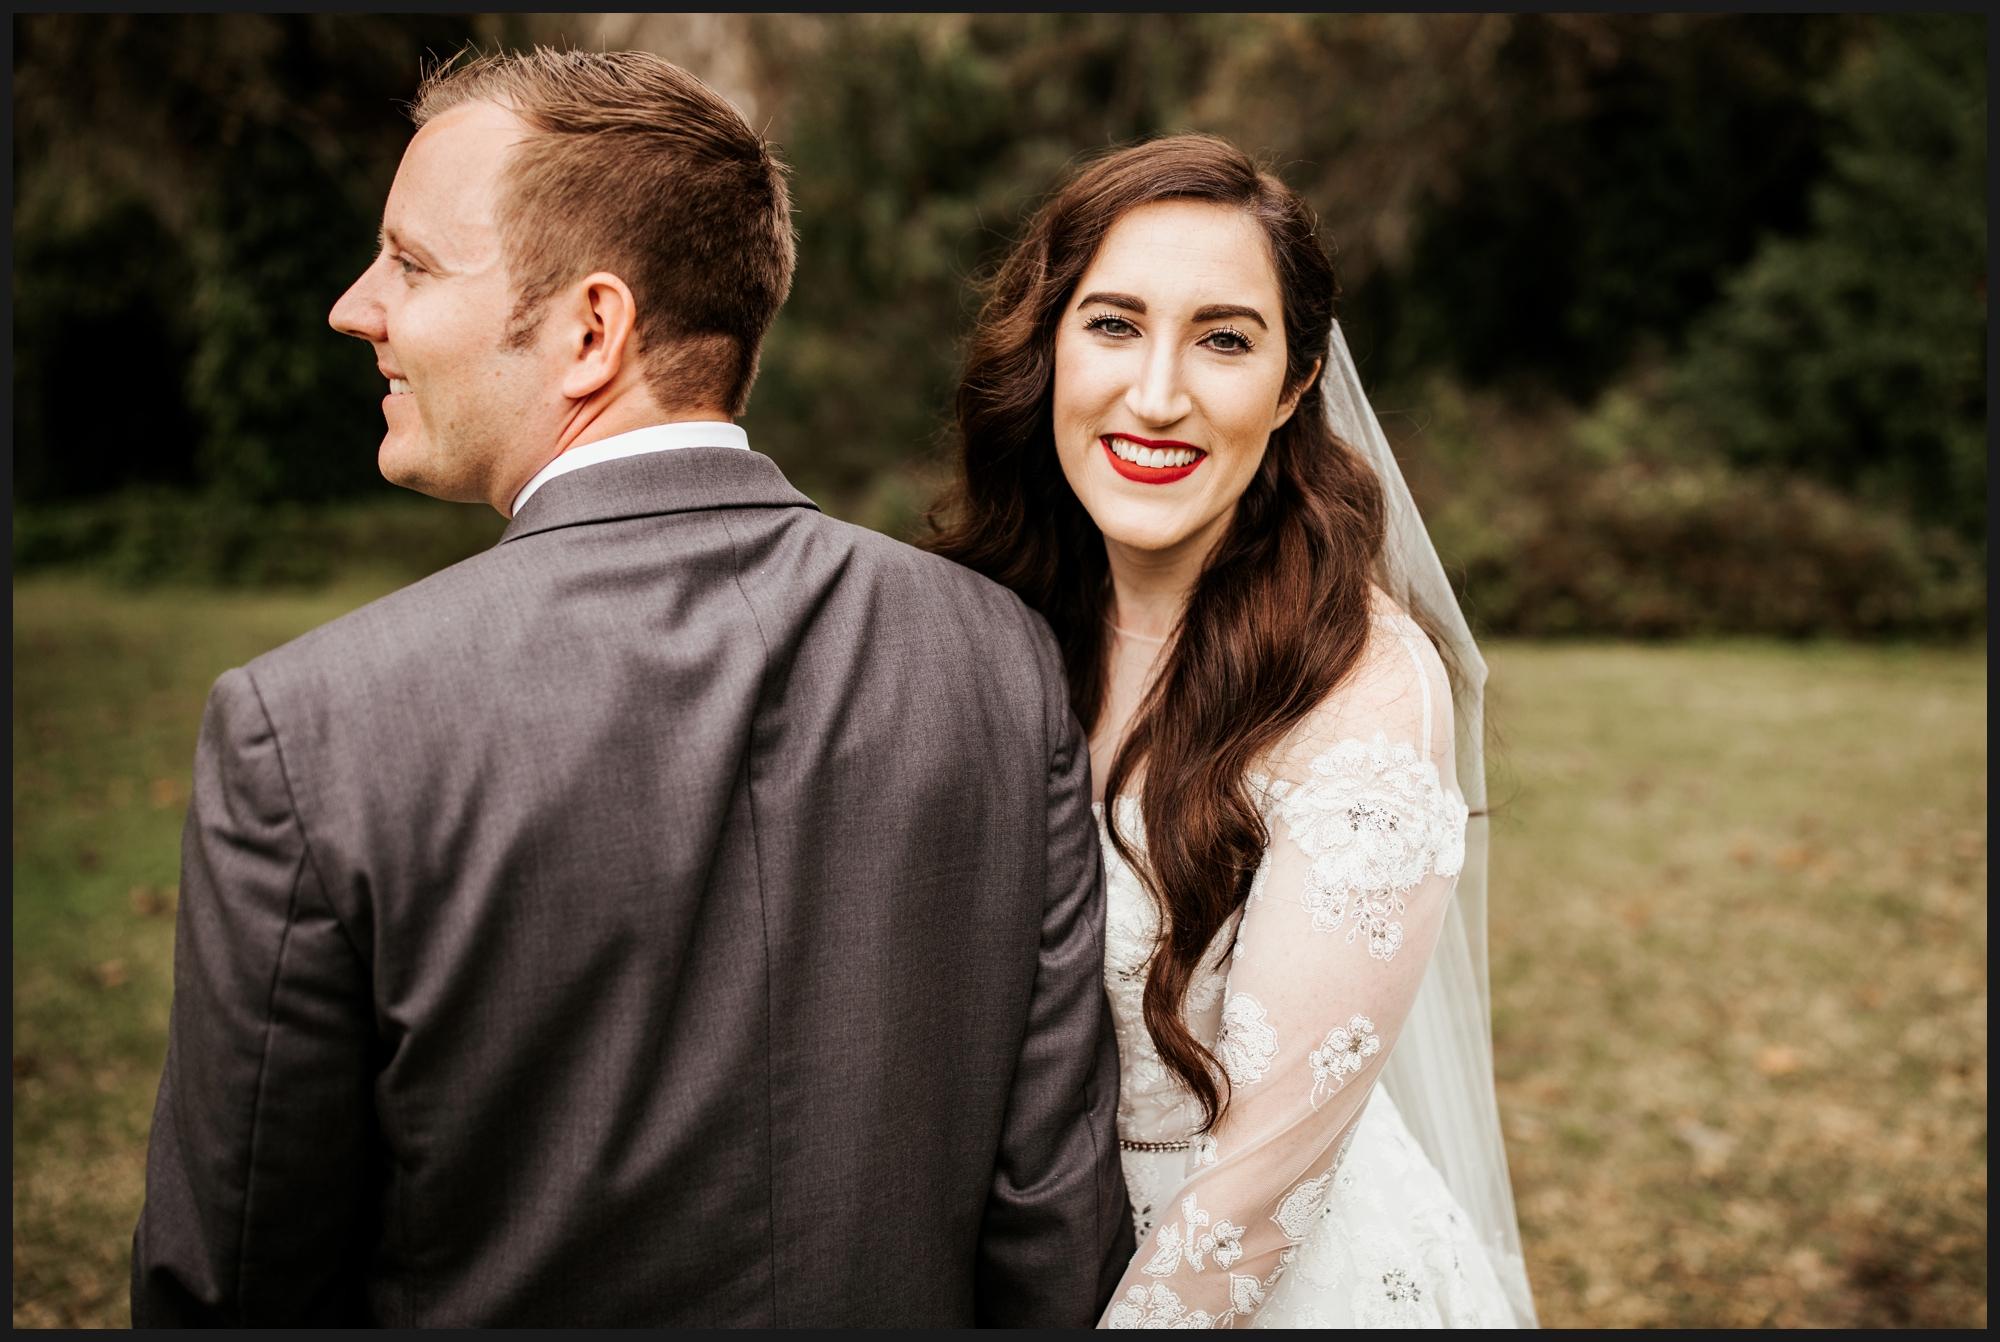 Orlando-Wedding-Photographer-destination-wedding-photographer-florida-wedding-photographer-hawaii-wedding-photographer_0510.jpg